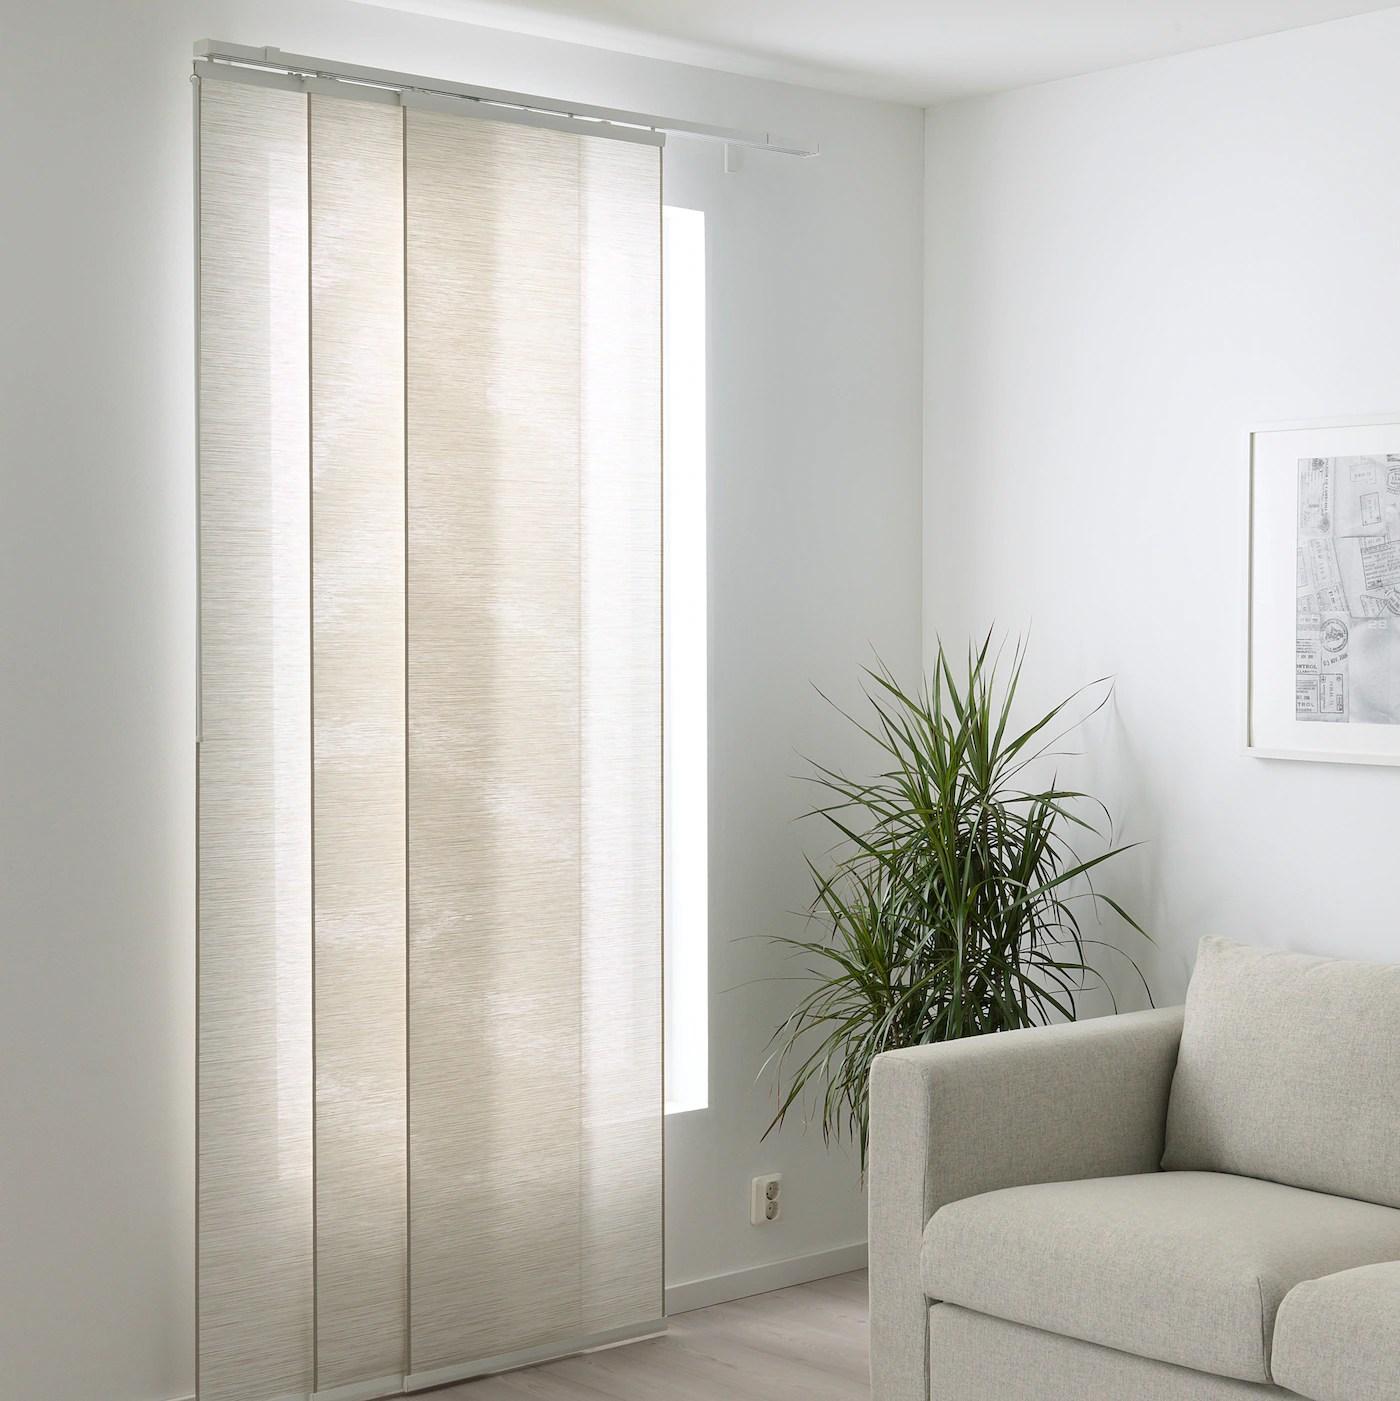 fonsterviva panel curtain white beige 24x118